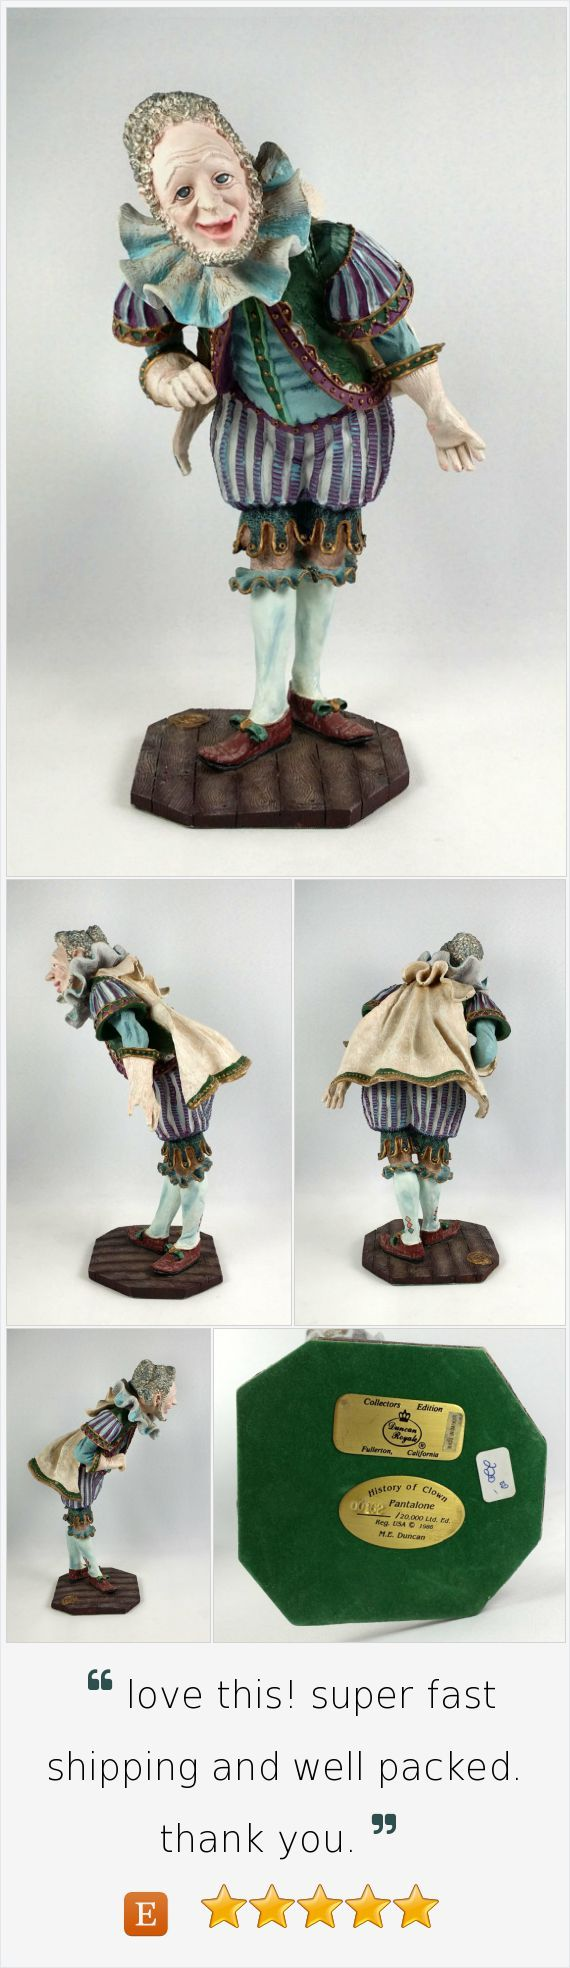 Duncan Royale History of Clown Pantalone Figurine Ltd Edition 162 / 120000 Rare